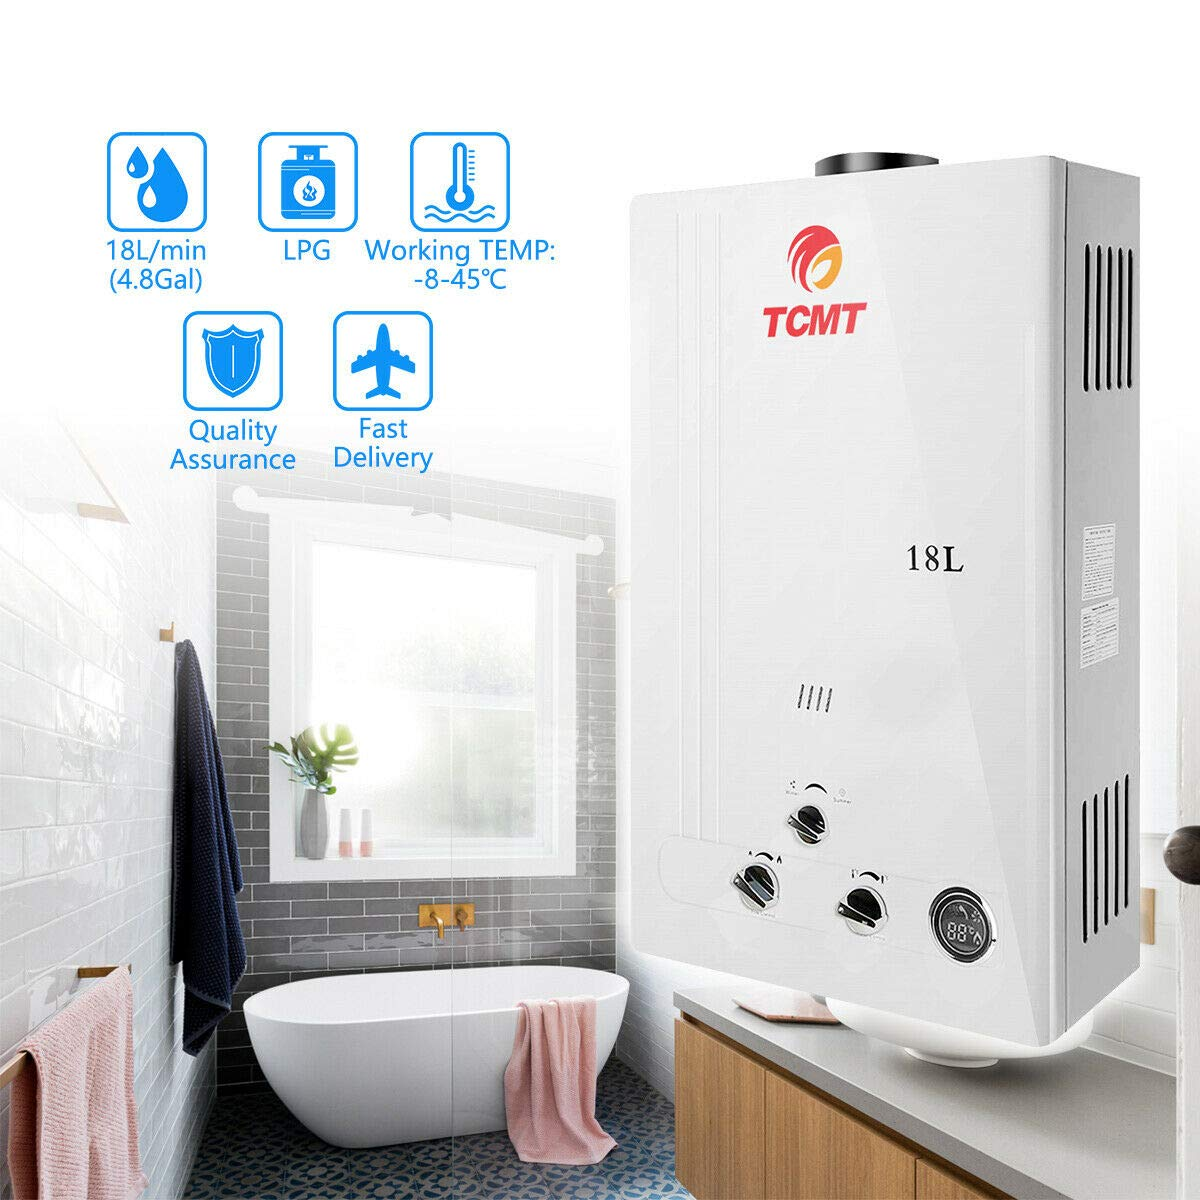 Tengchang 18L LPG Propane Gas Hot Water Heater Tankless Instant Boiler Digital Display Shower Home by Tengchang (Image #1)